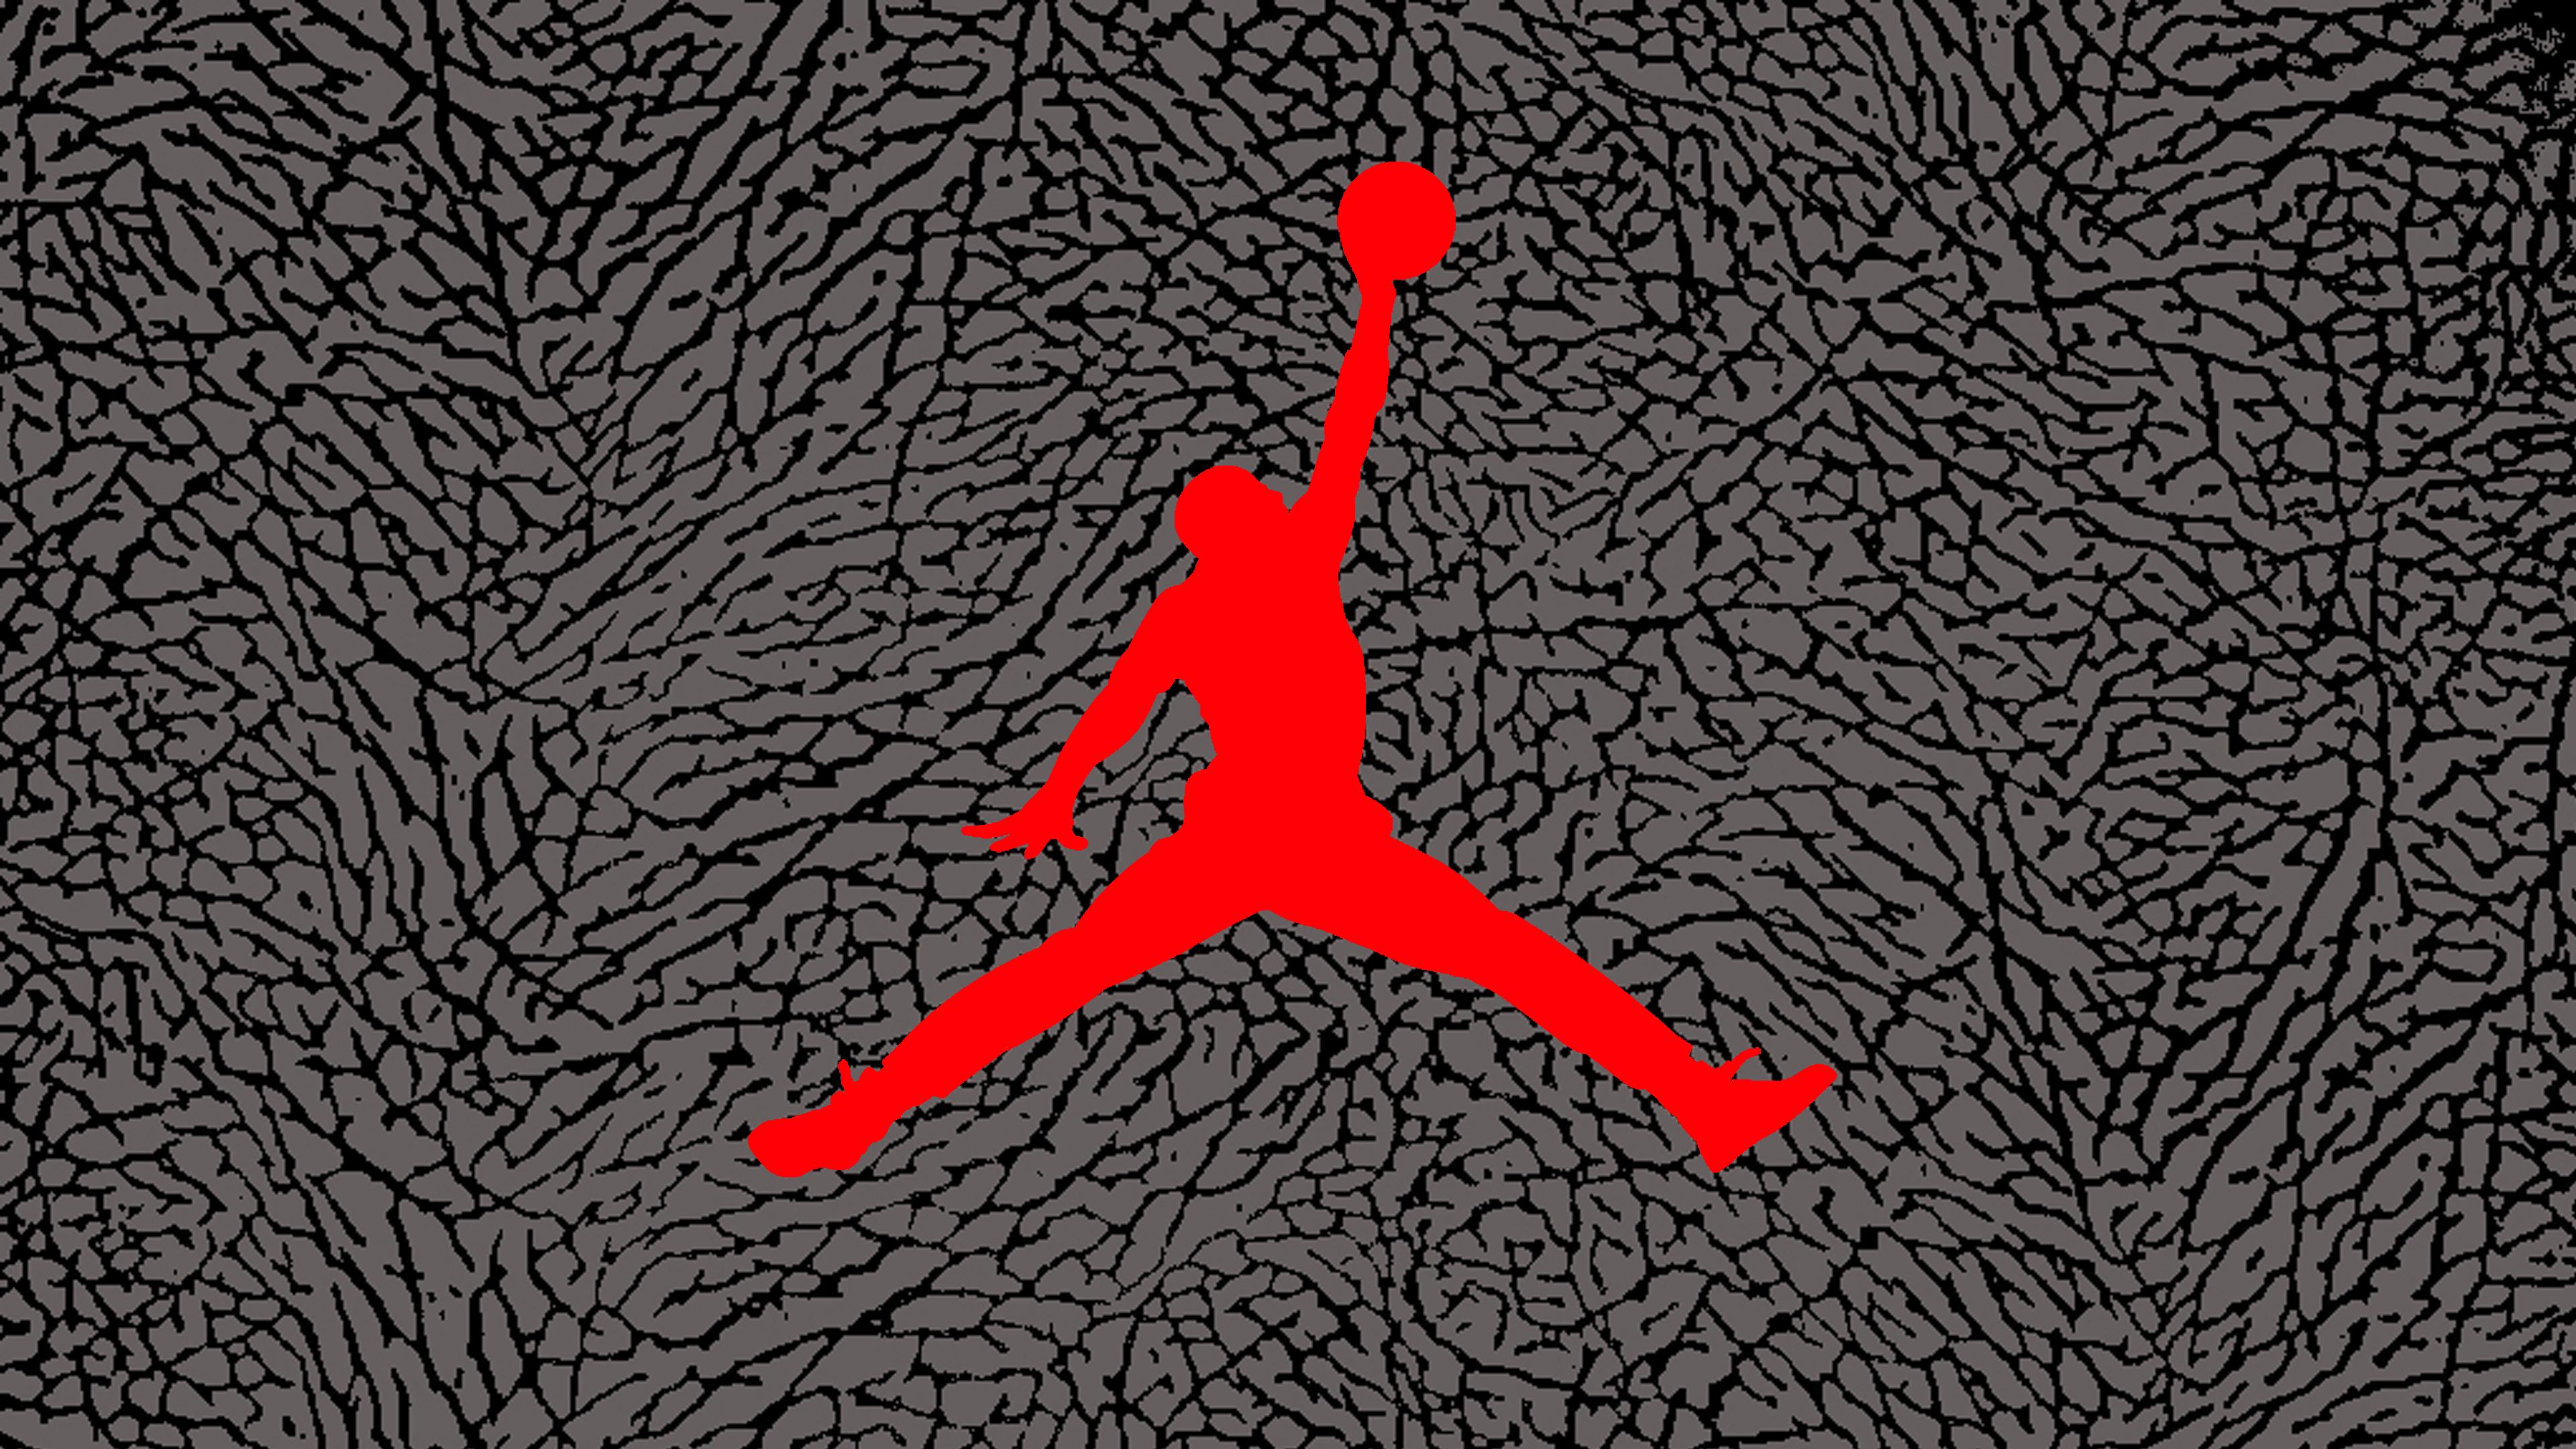 Air Jordan Backgrounds Milos Gemaljevic artwork amp design 3840x2160